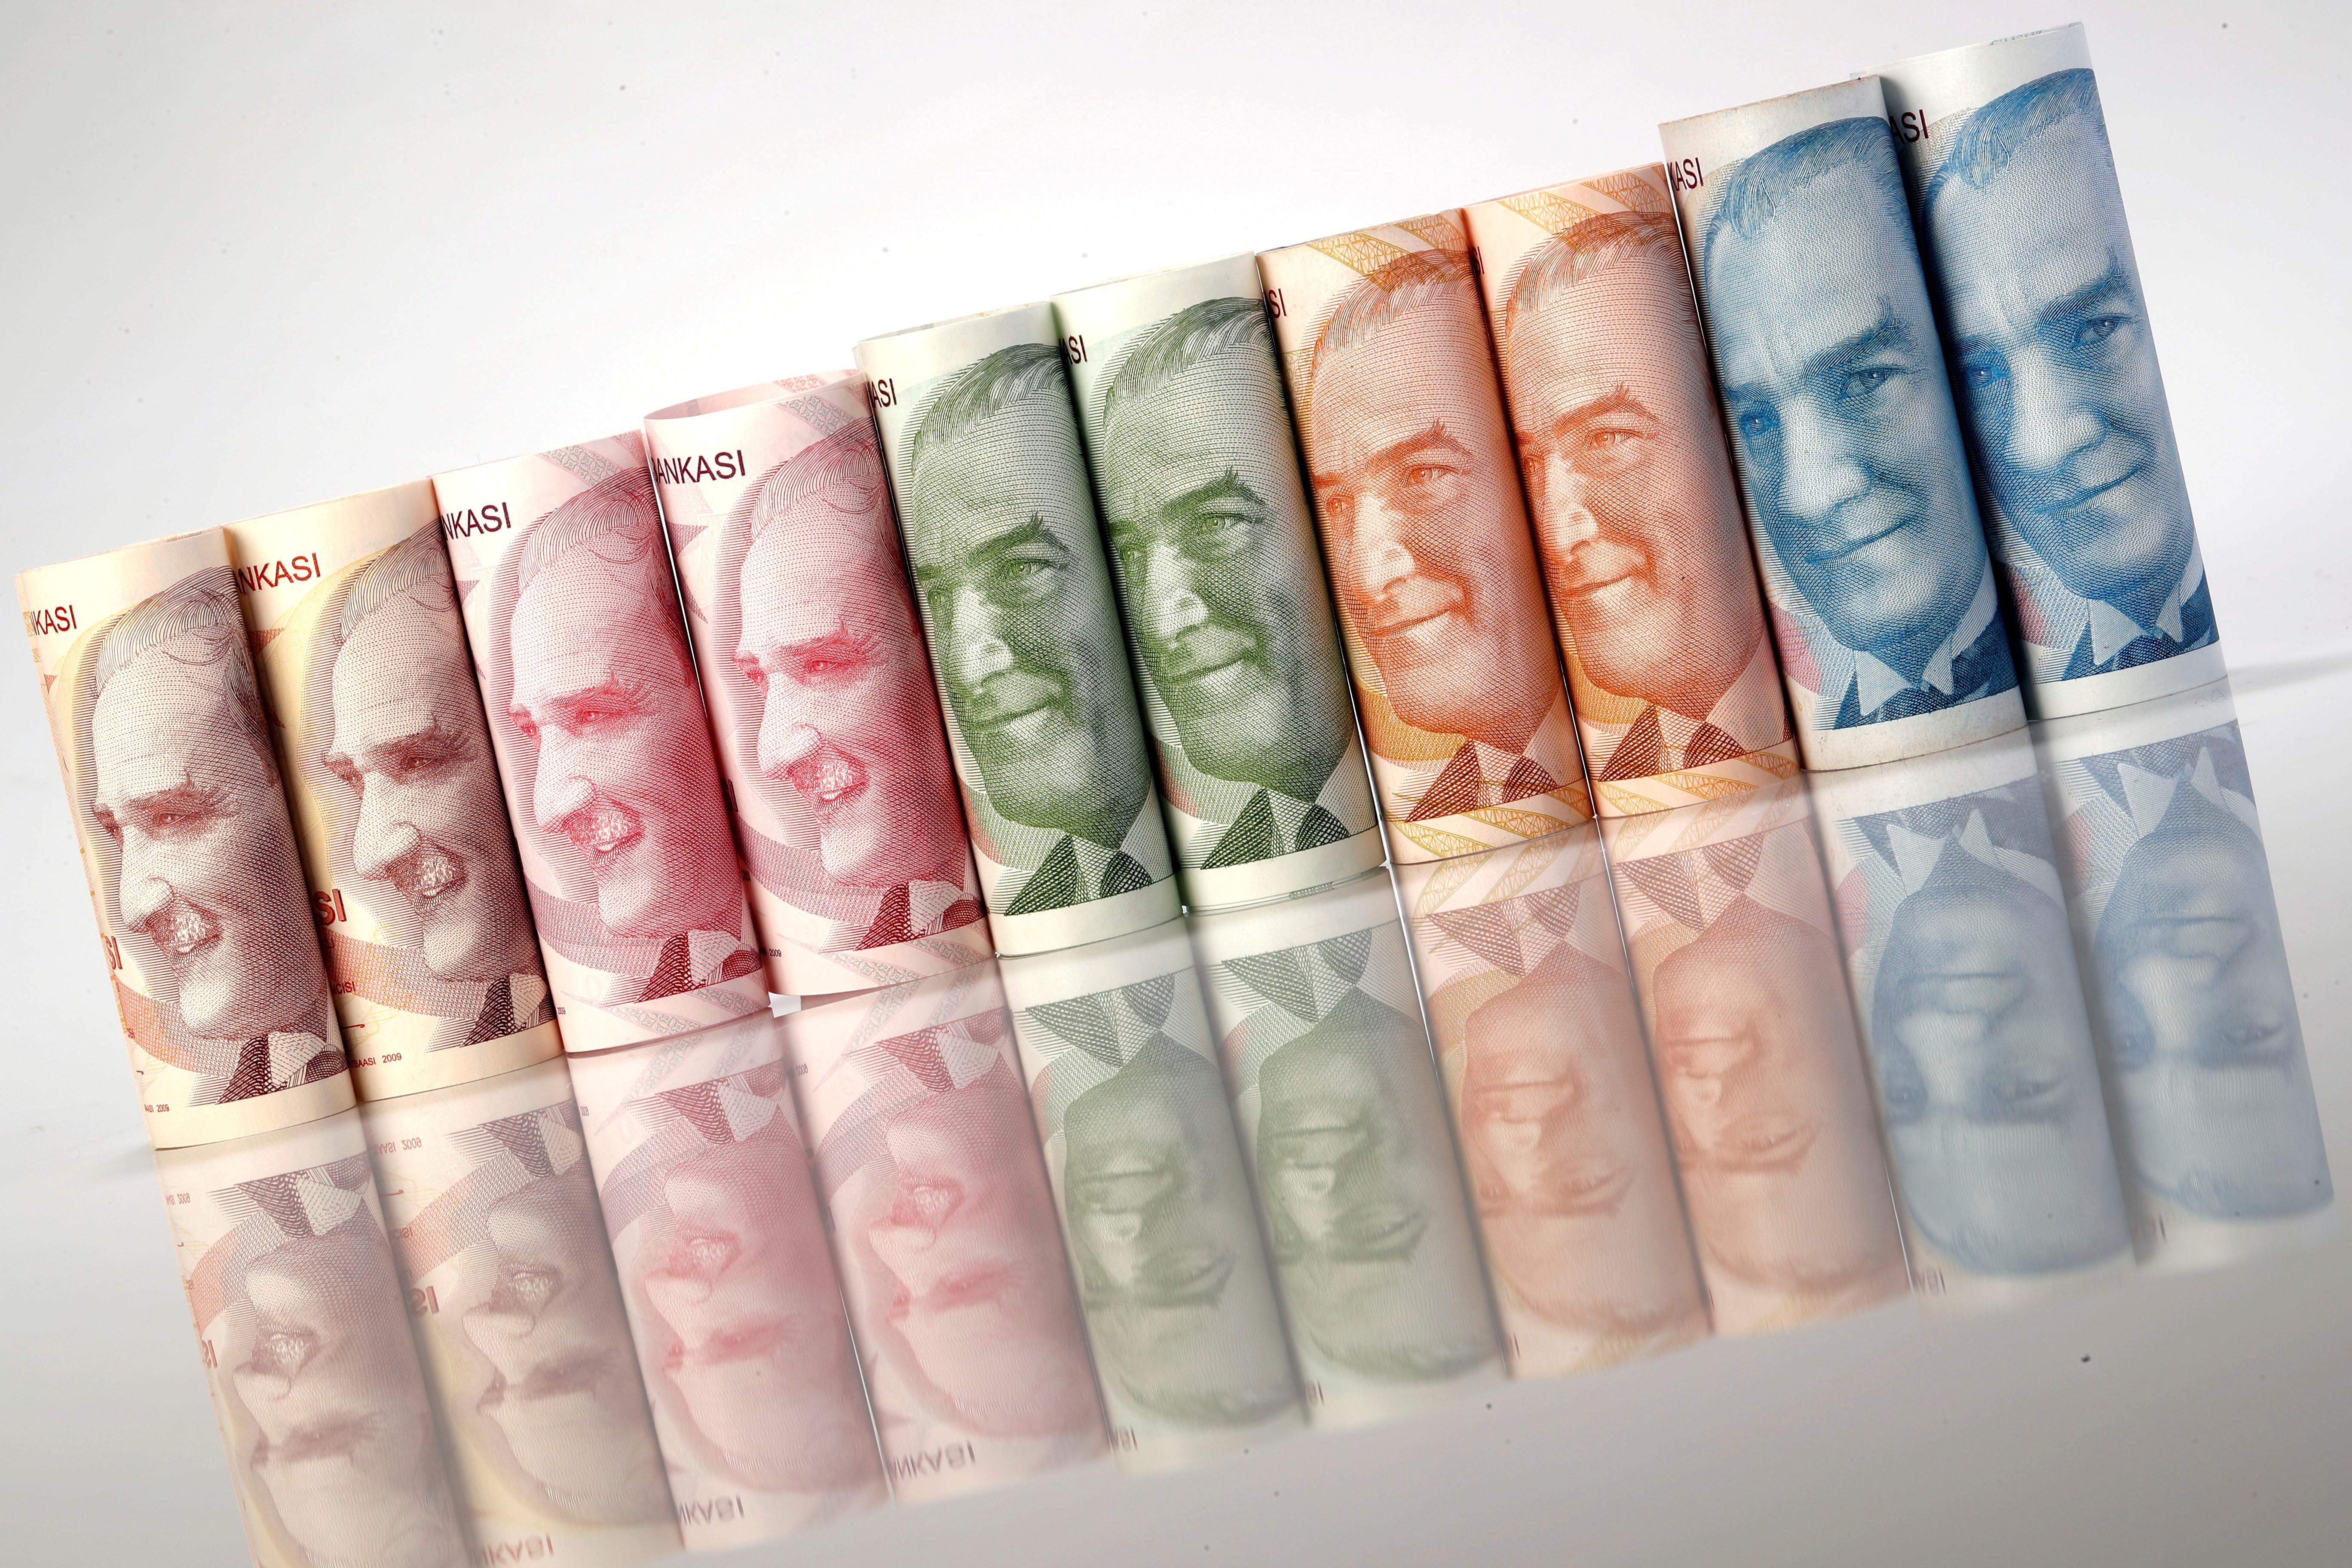 Turkish lira weakens after U.S. halts F-35 equipment offer